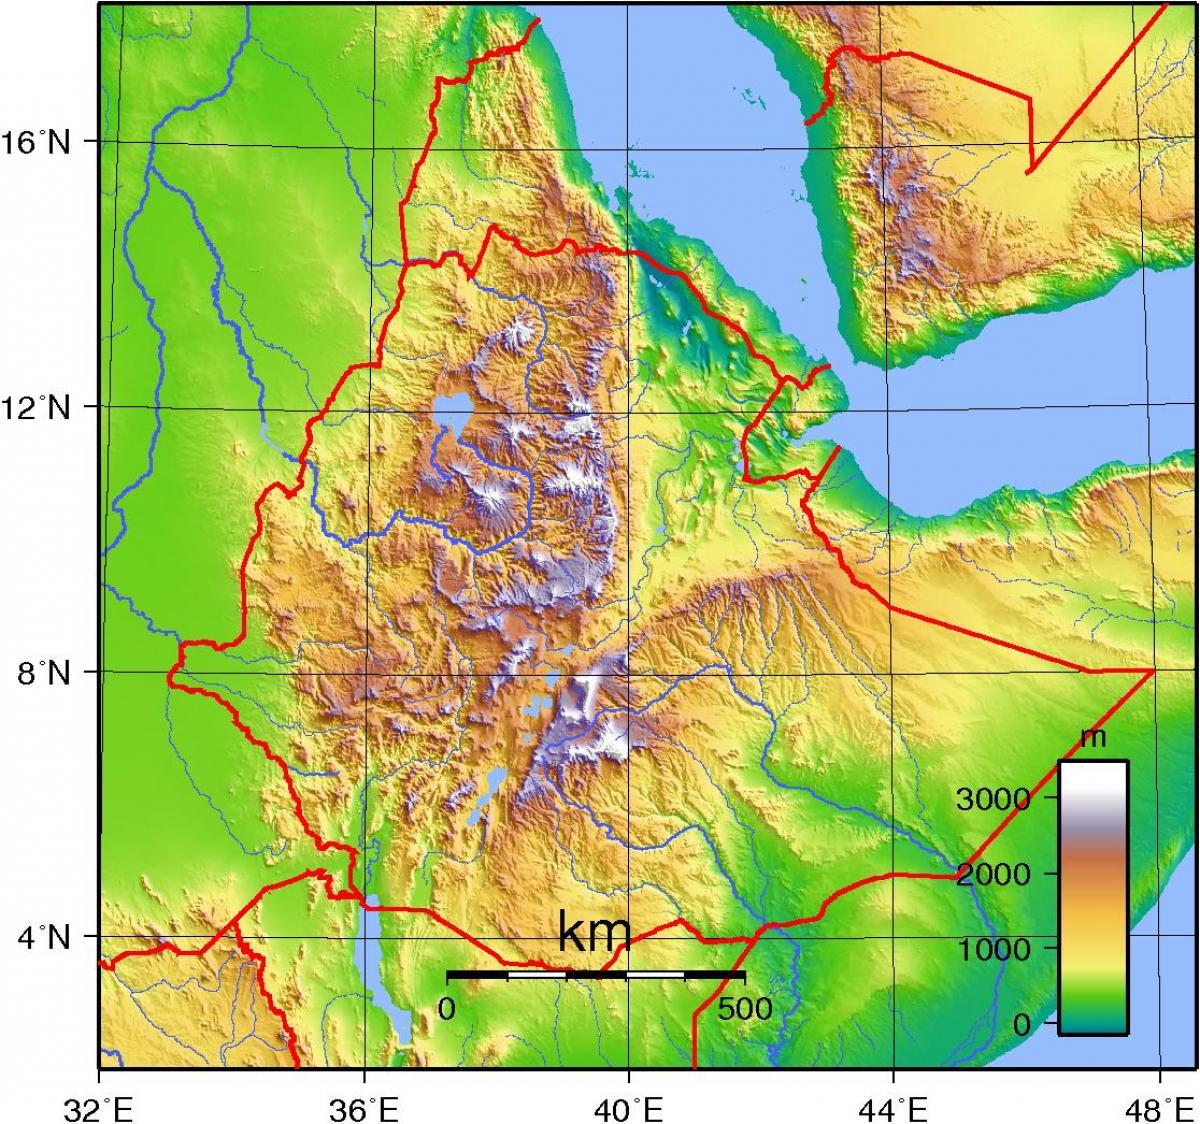 Fysisk Kort Af Etiopien Etiopien Topografisk Kort Ostlige